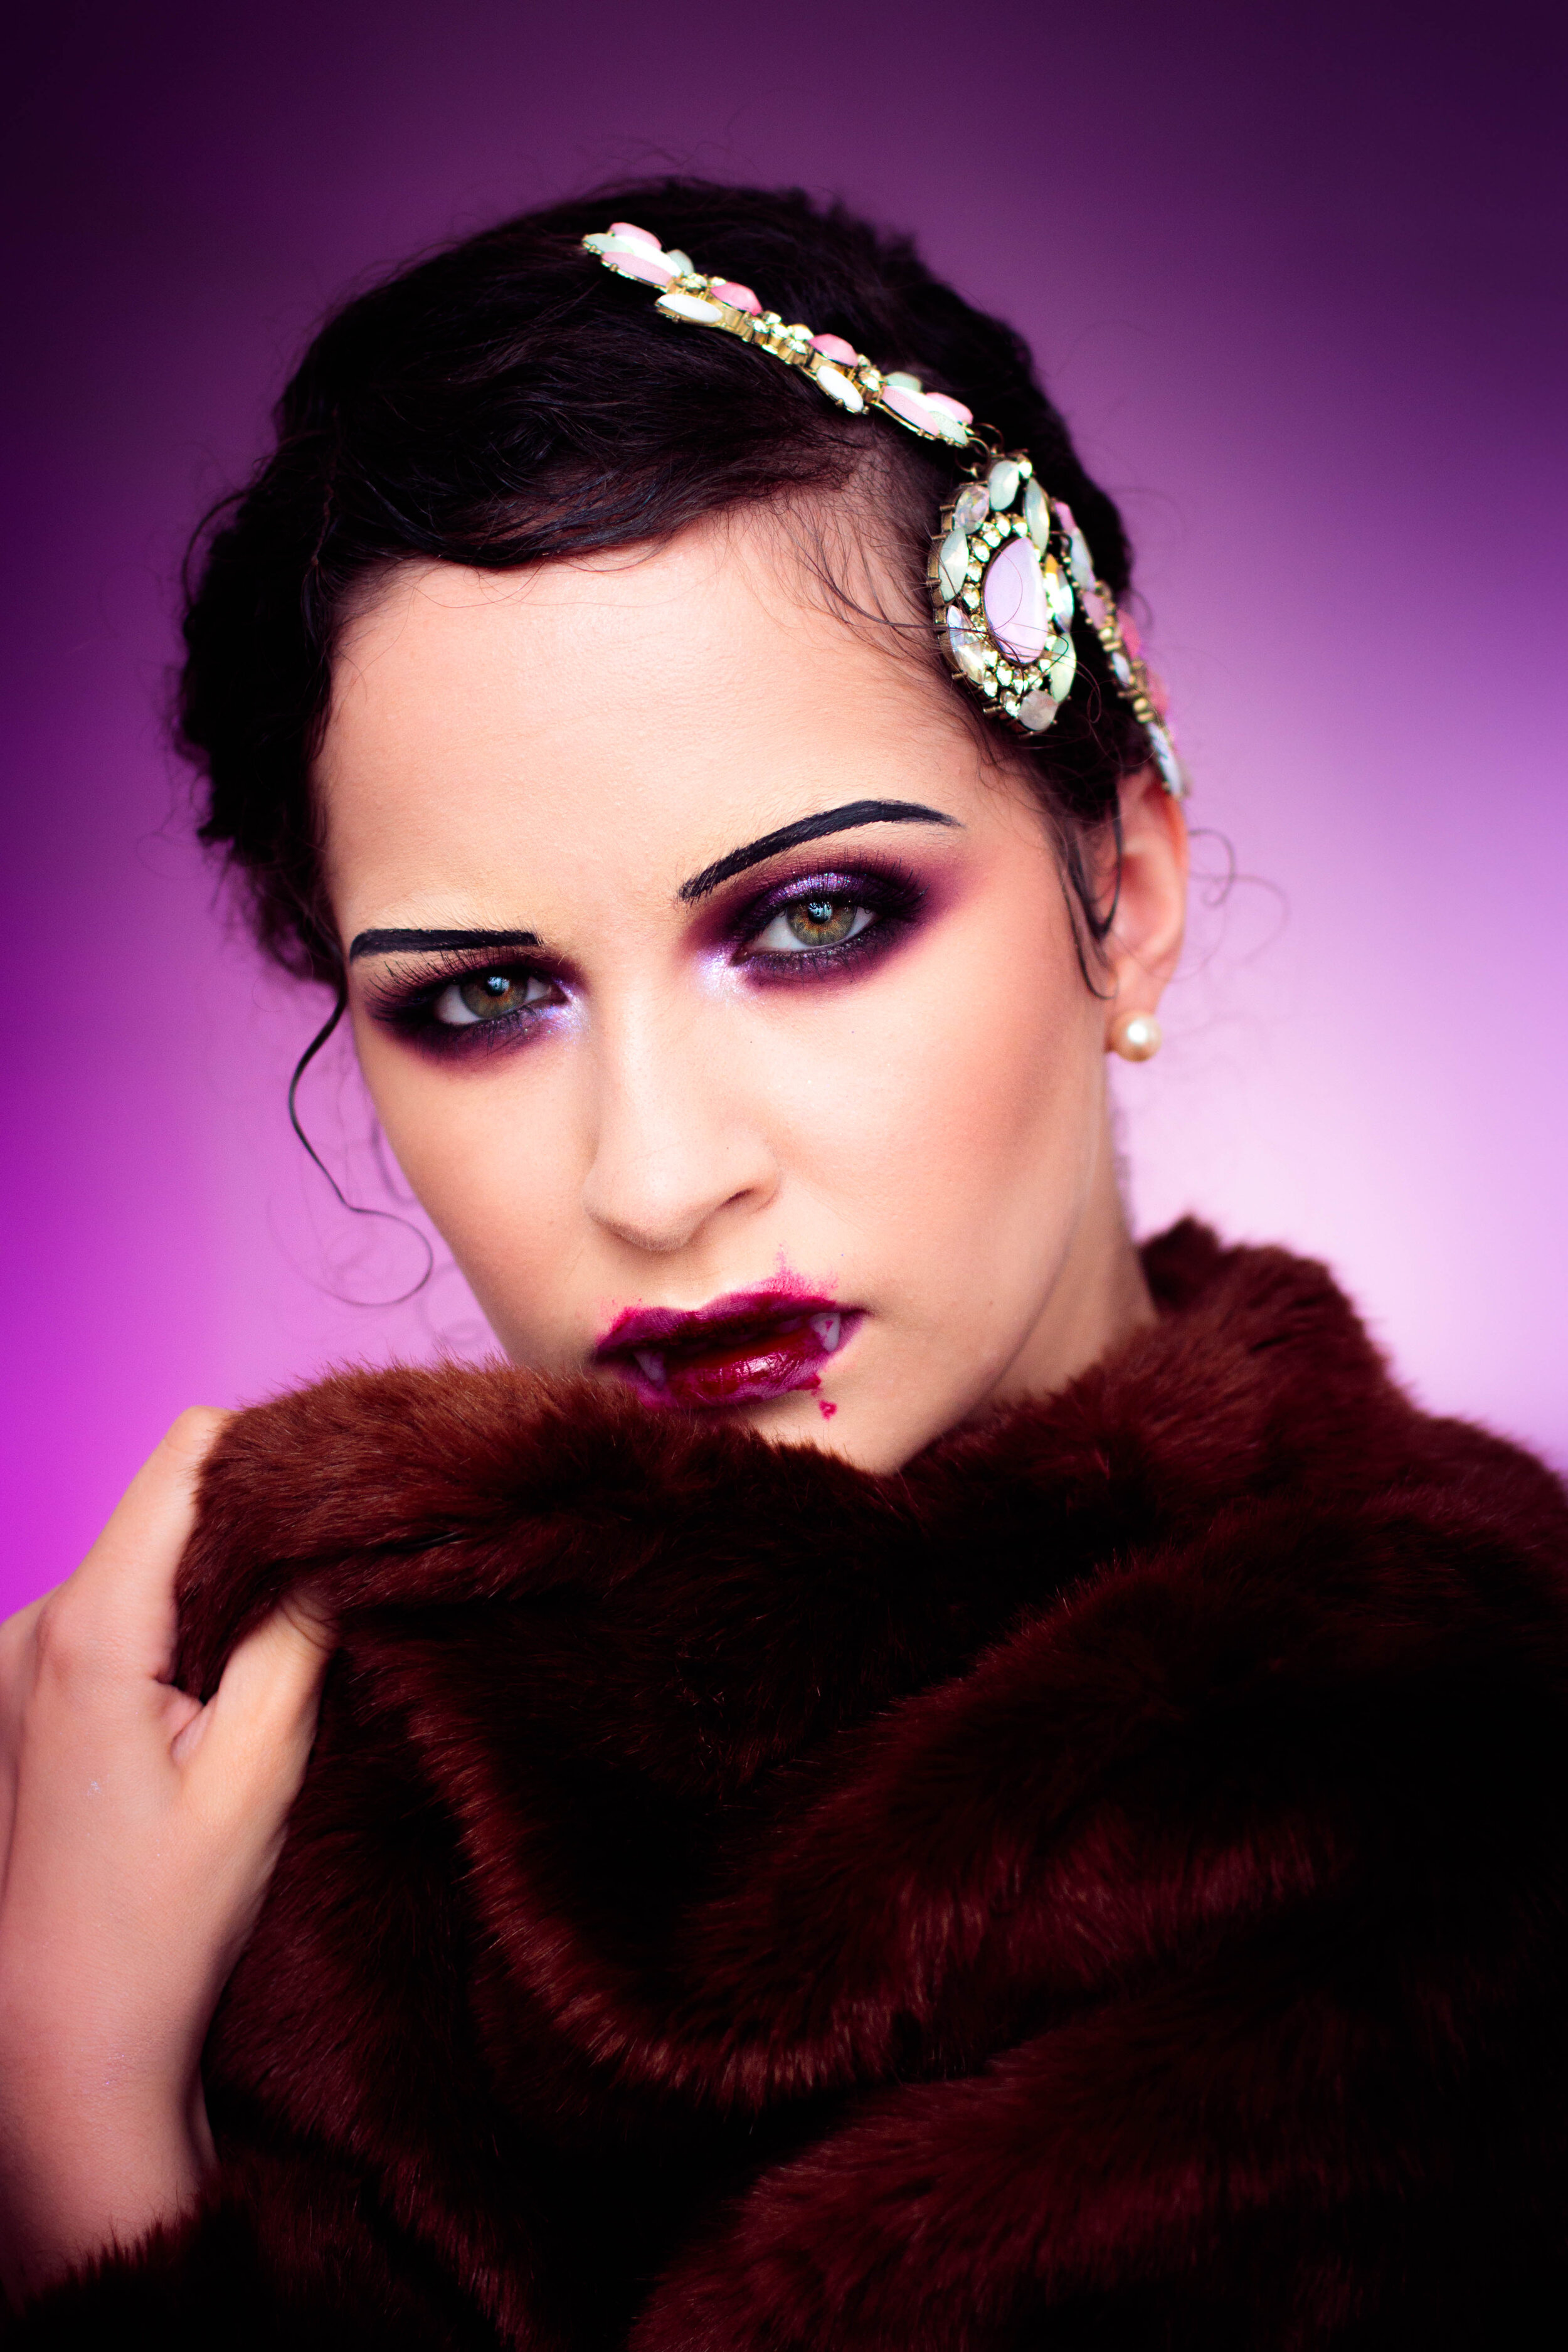 vintage-vampire-halloween-makeup-pauuulette-1.jpg